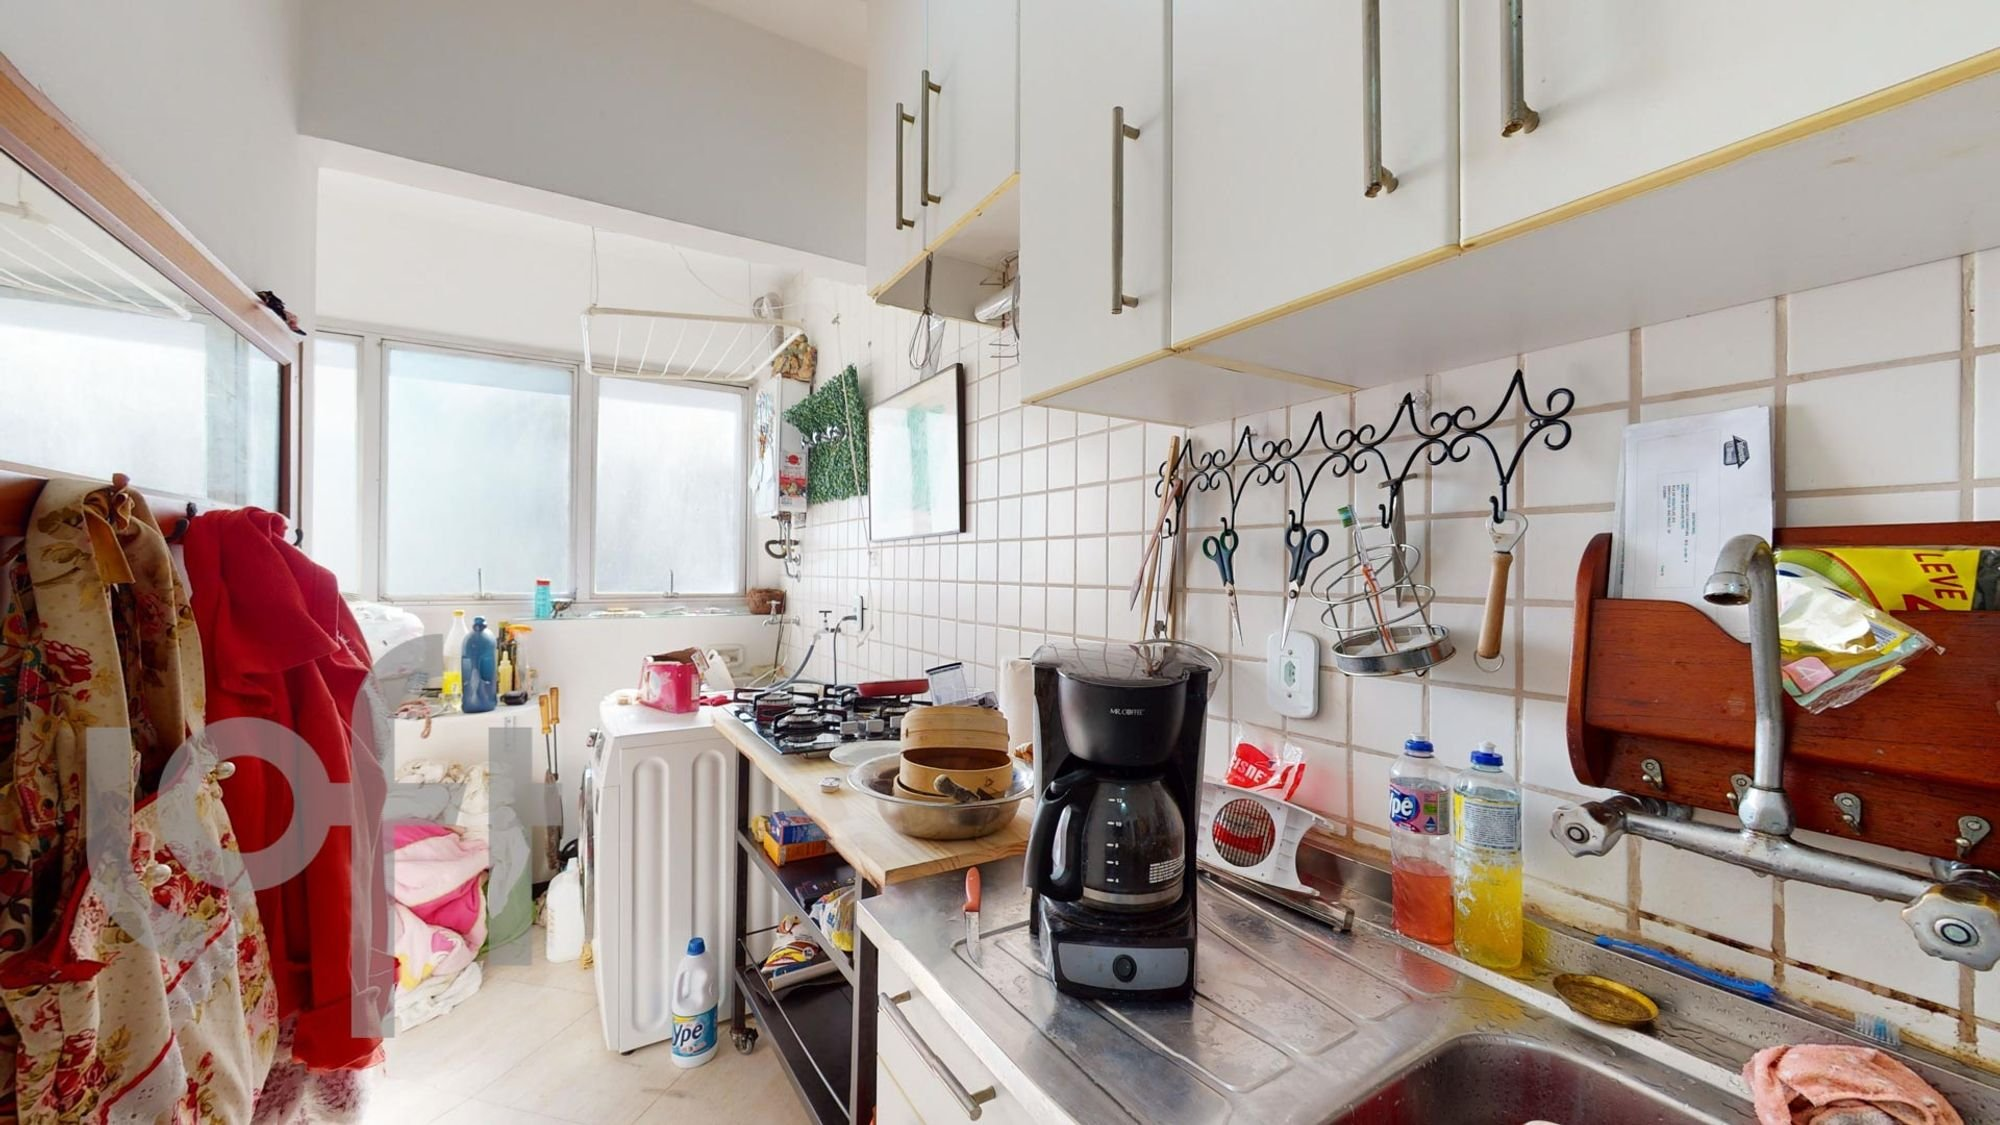 Foto de Cozinha com vaso de planta, garrafa, tigela, pia